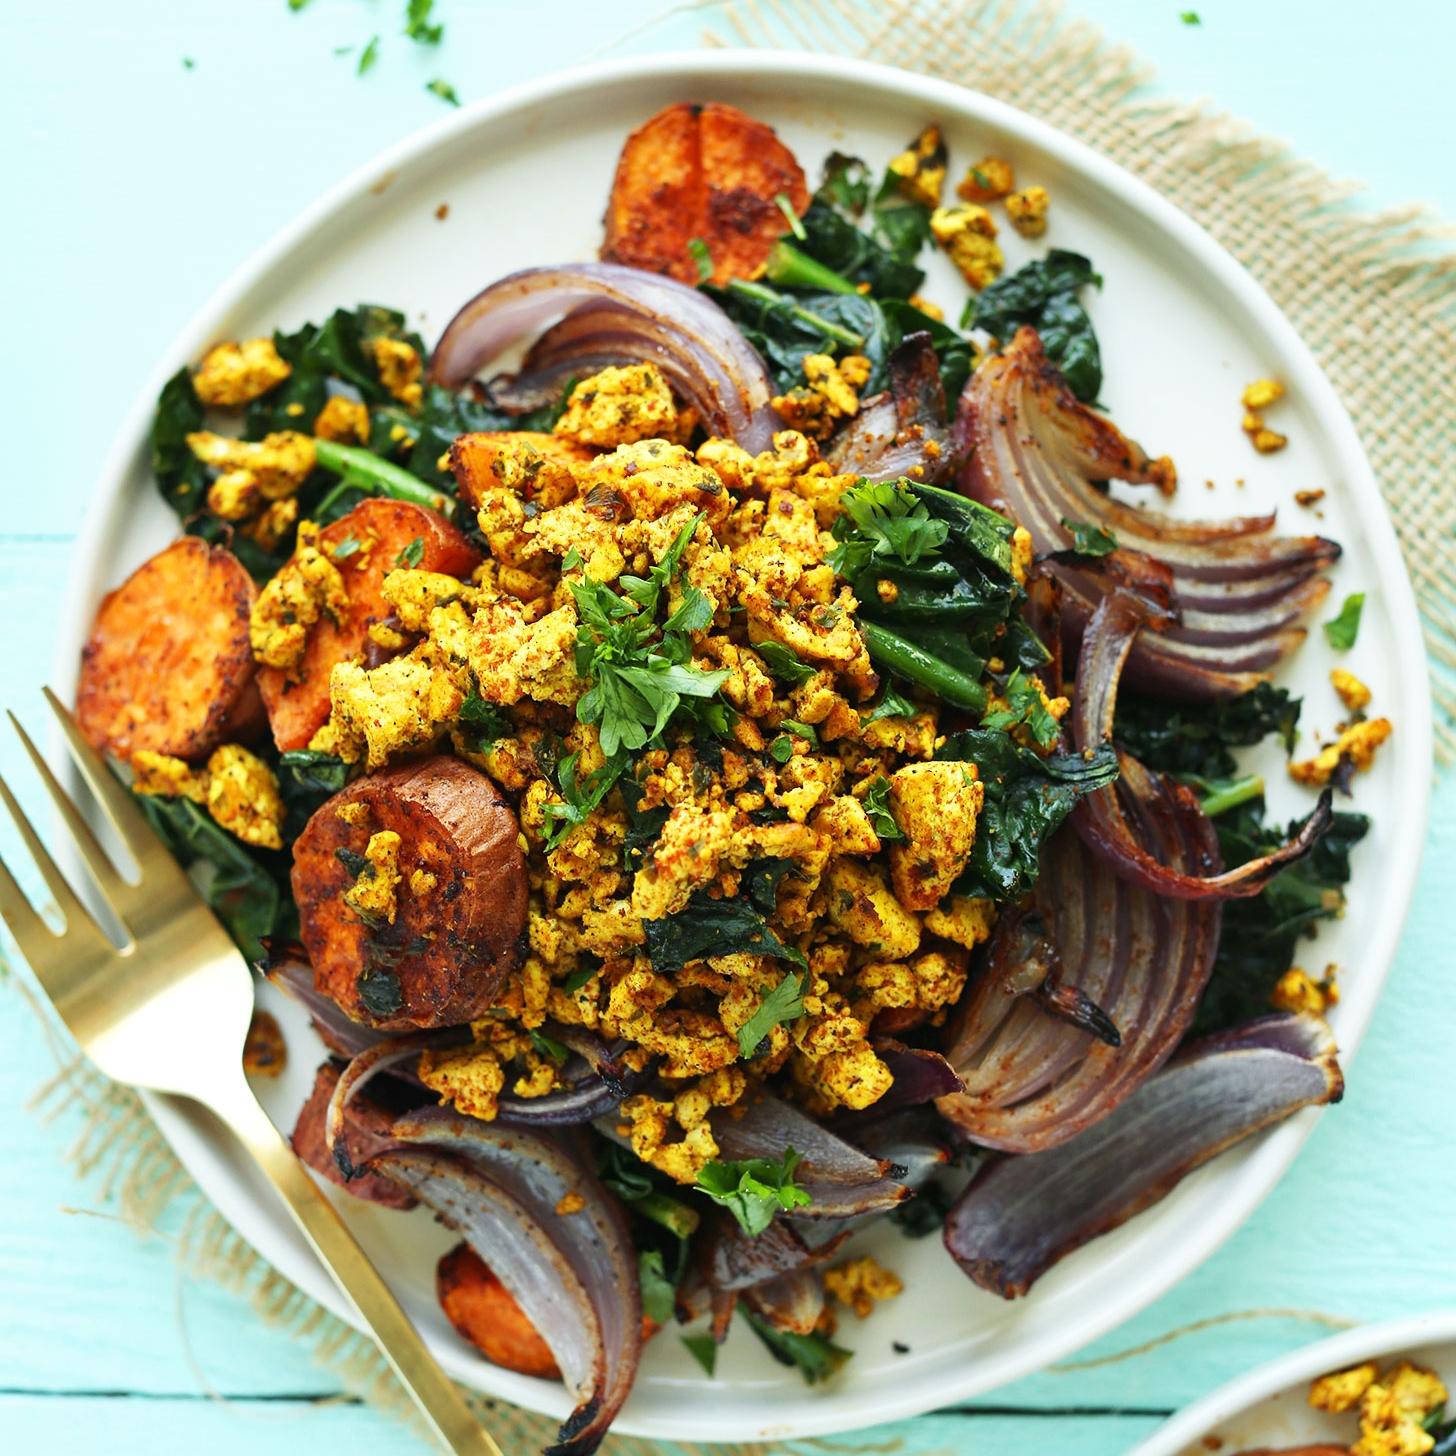 AMAZING-Savory-Tofu-Scramble-with-Kale-Sweet-Potatoes-and-Roasted-Red-Onion-Flavorful-plant-based-and-SO-satisfying-vegan-glutenfree-tofuscramble-breakfast-recipe.jpg